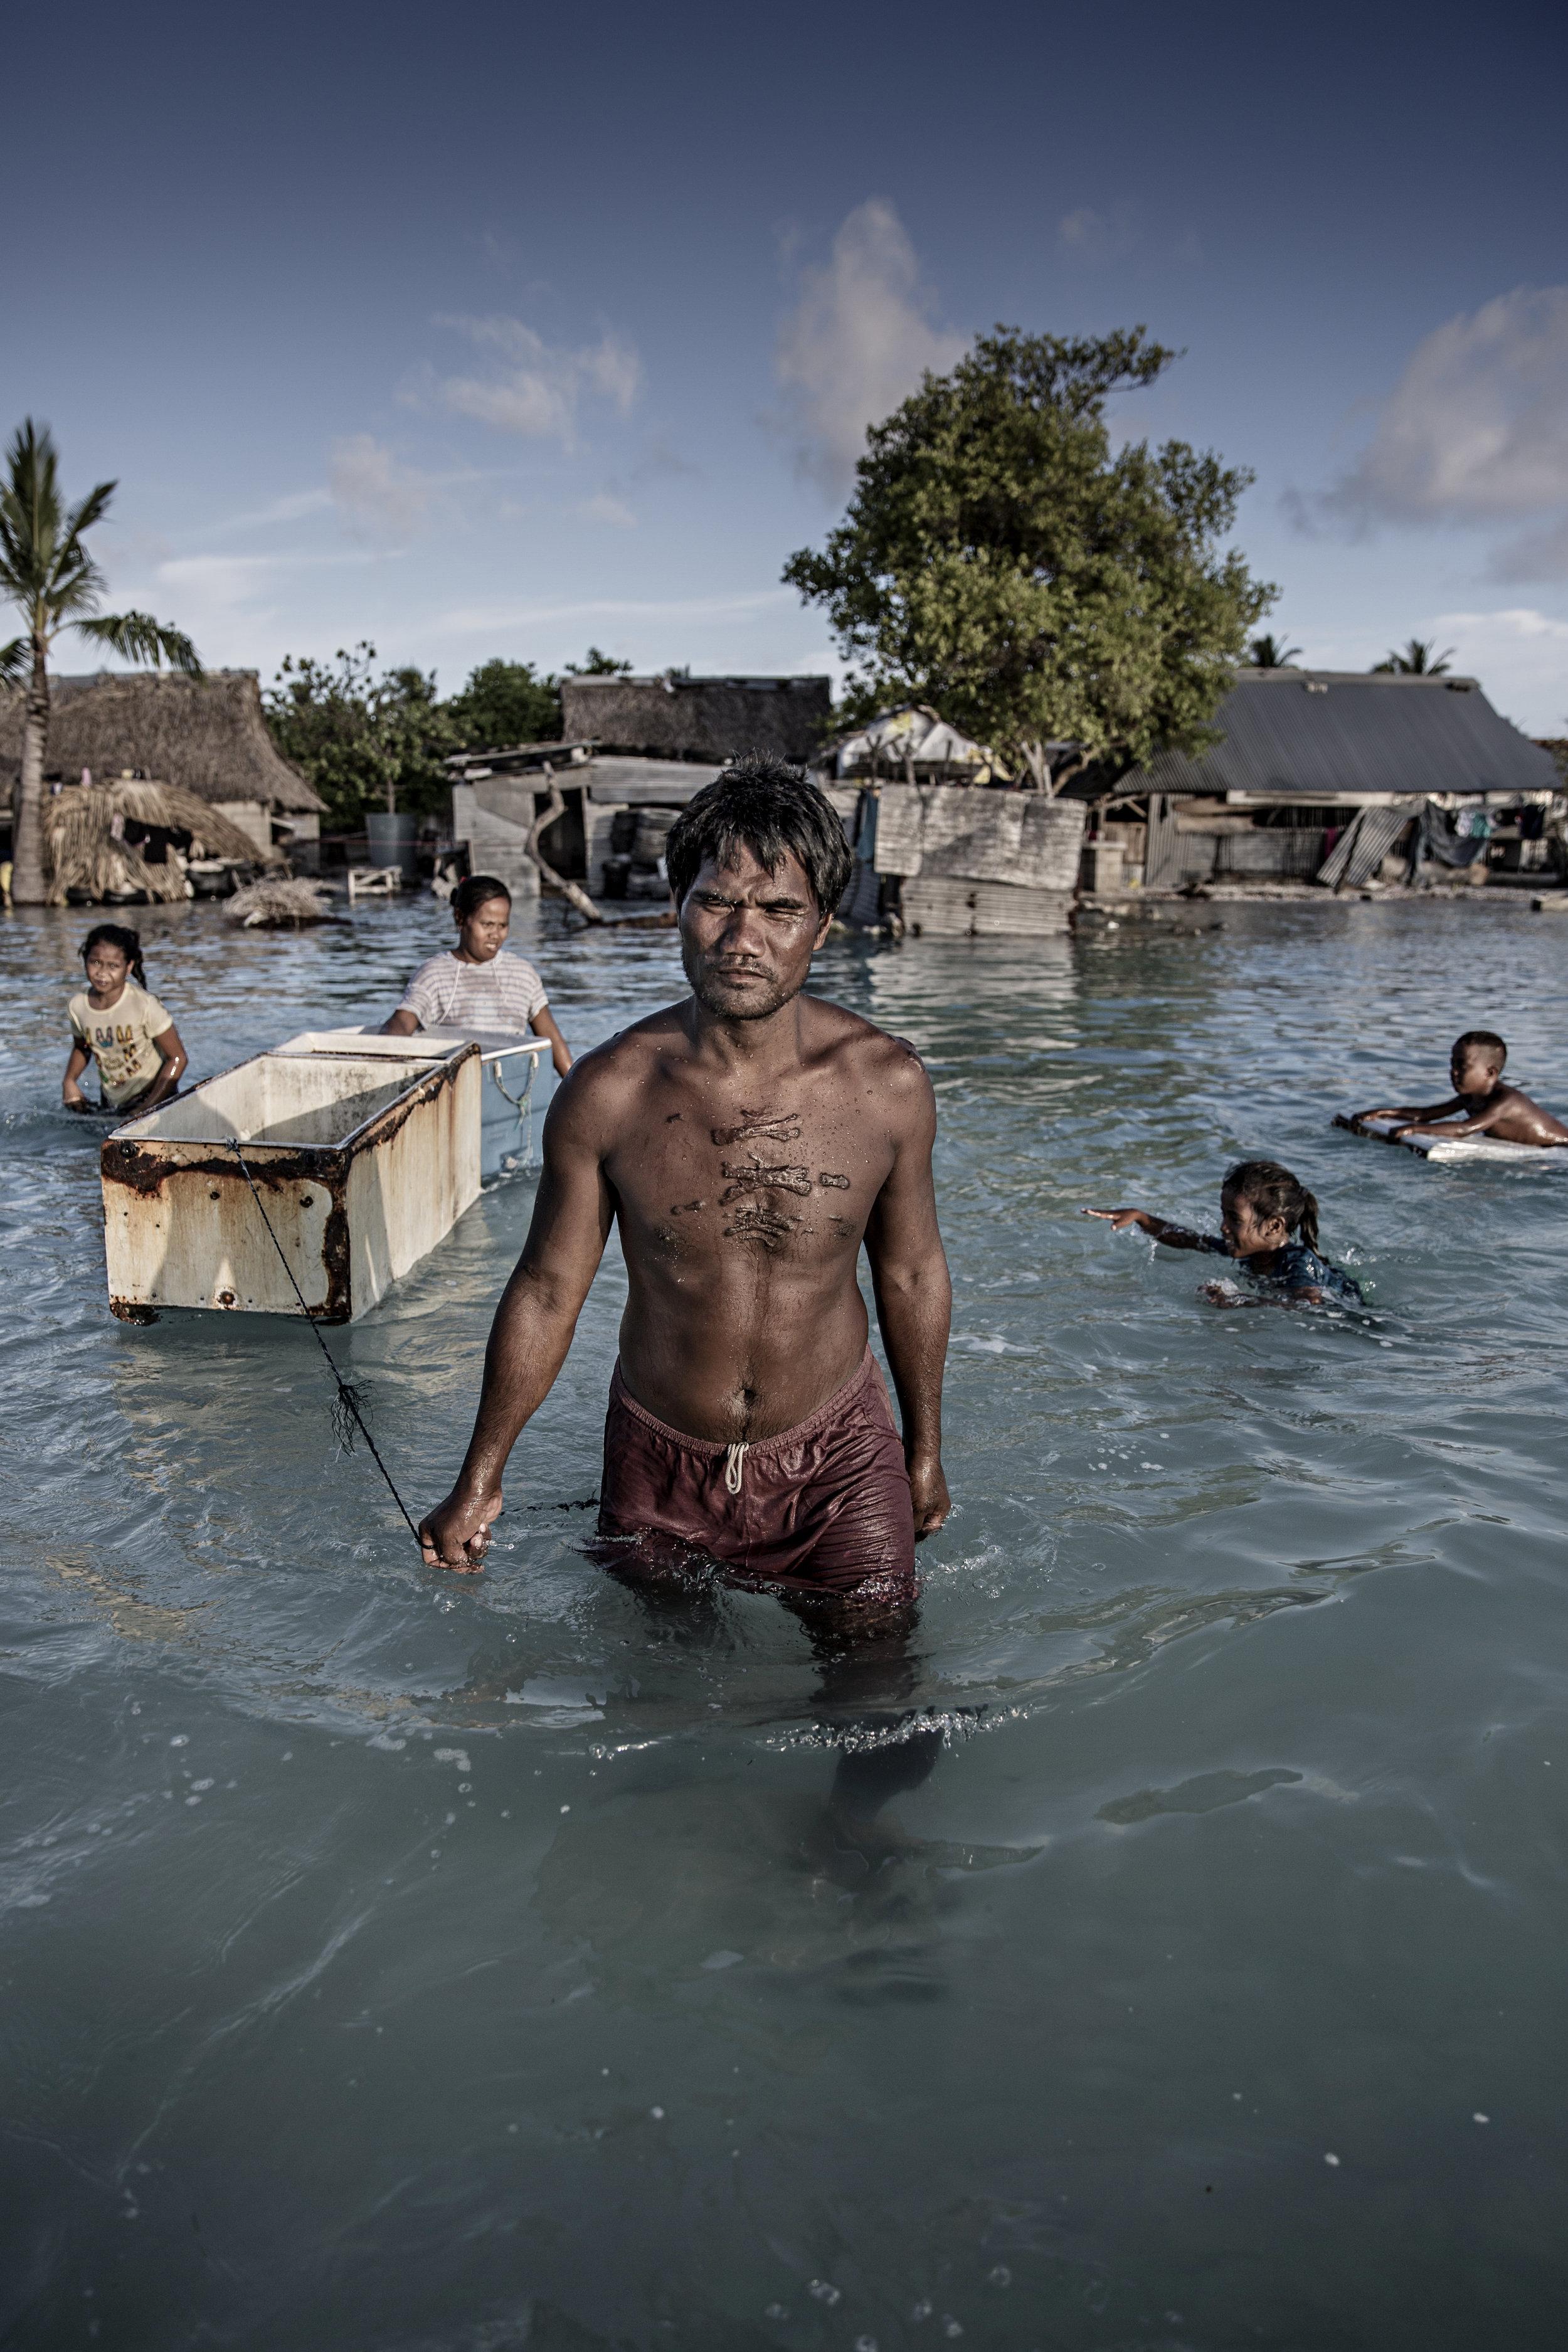 The sea floods the land / Kiribati - 2015